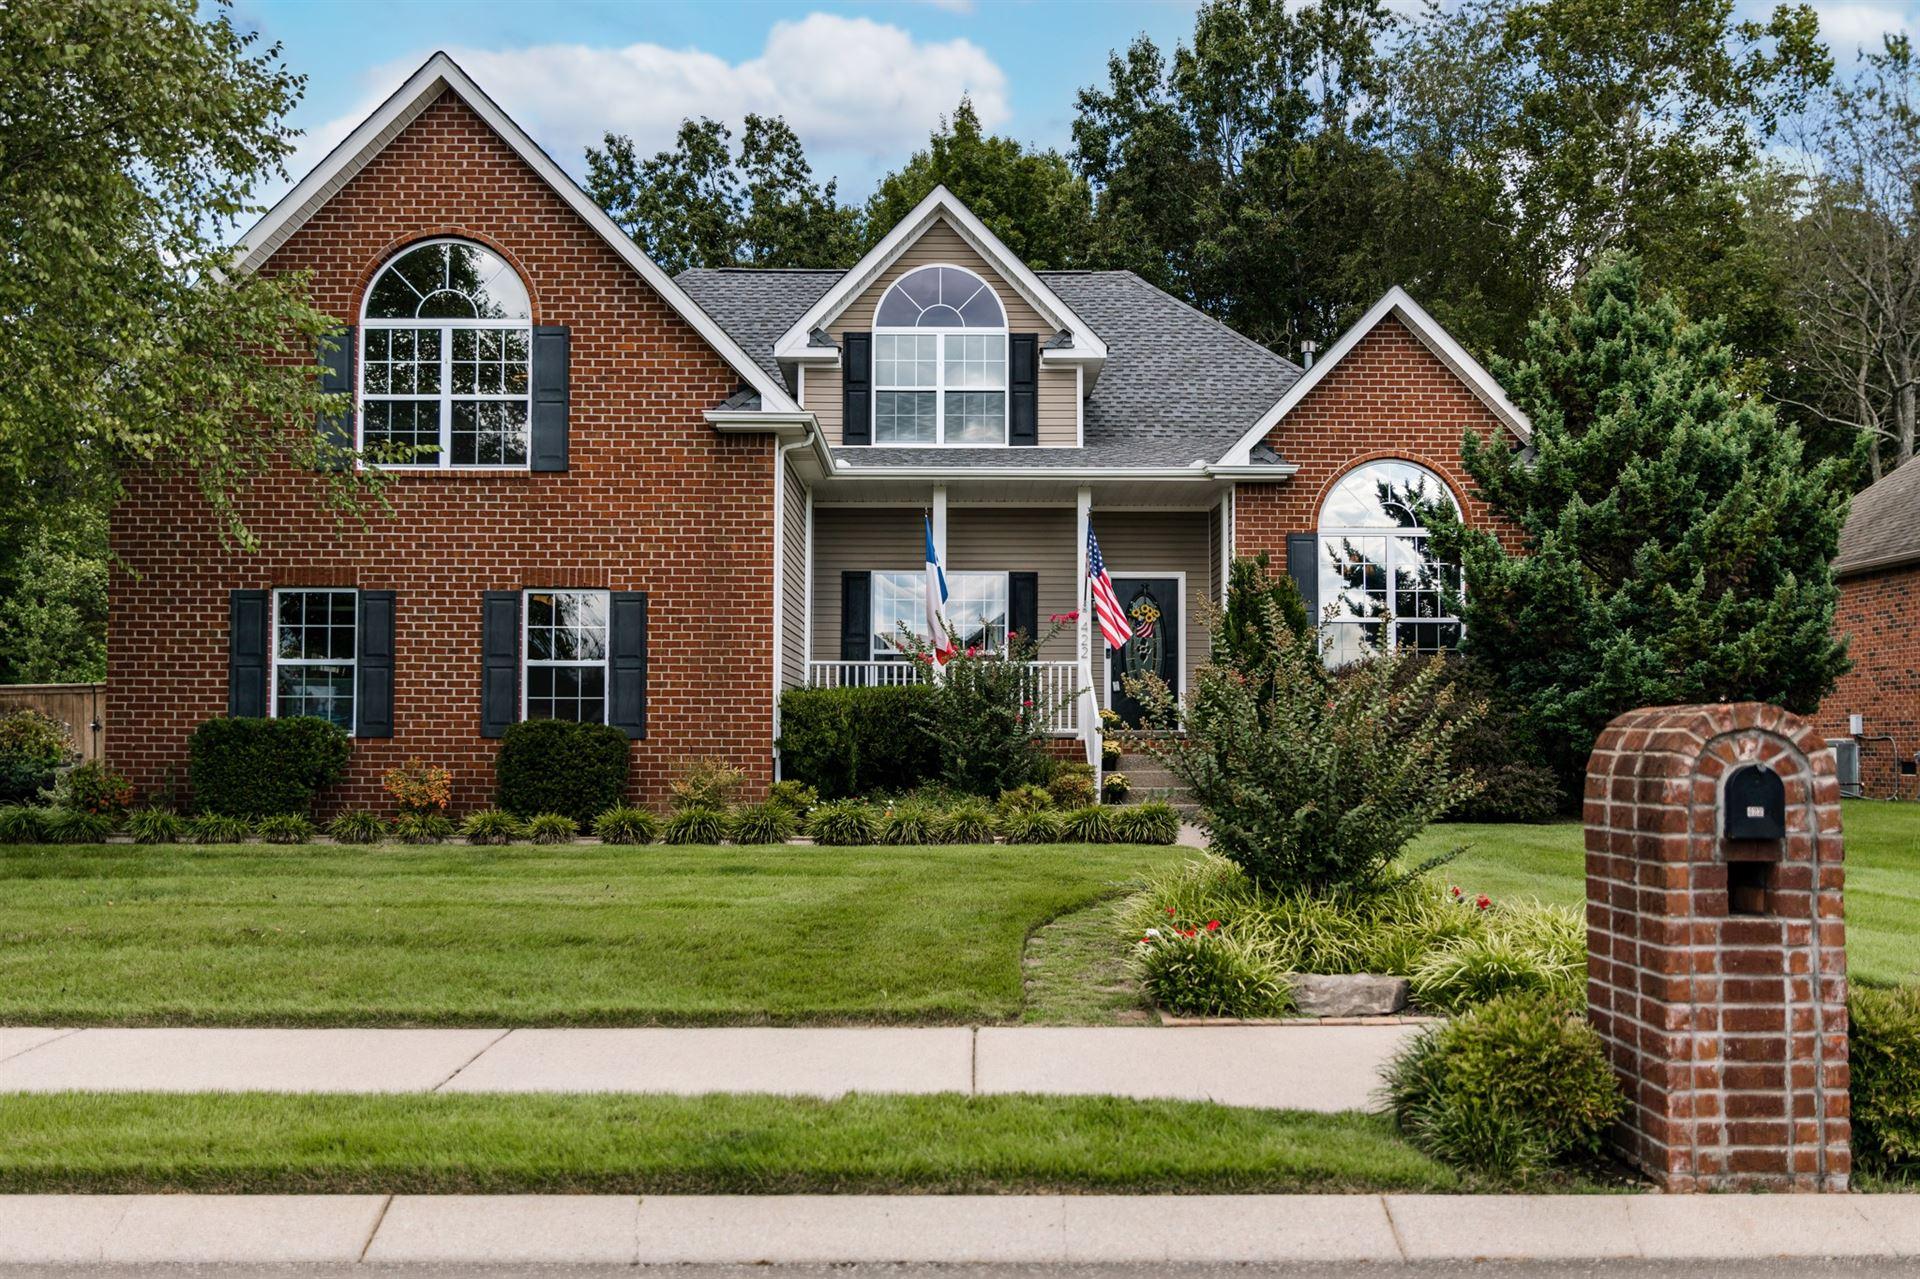 422 Sheffield Dr, White House, TN 37188 - MLS#: 2290359